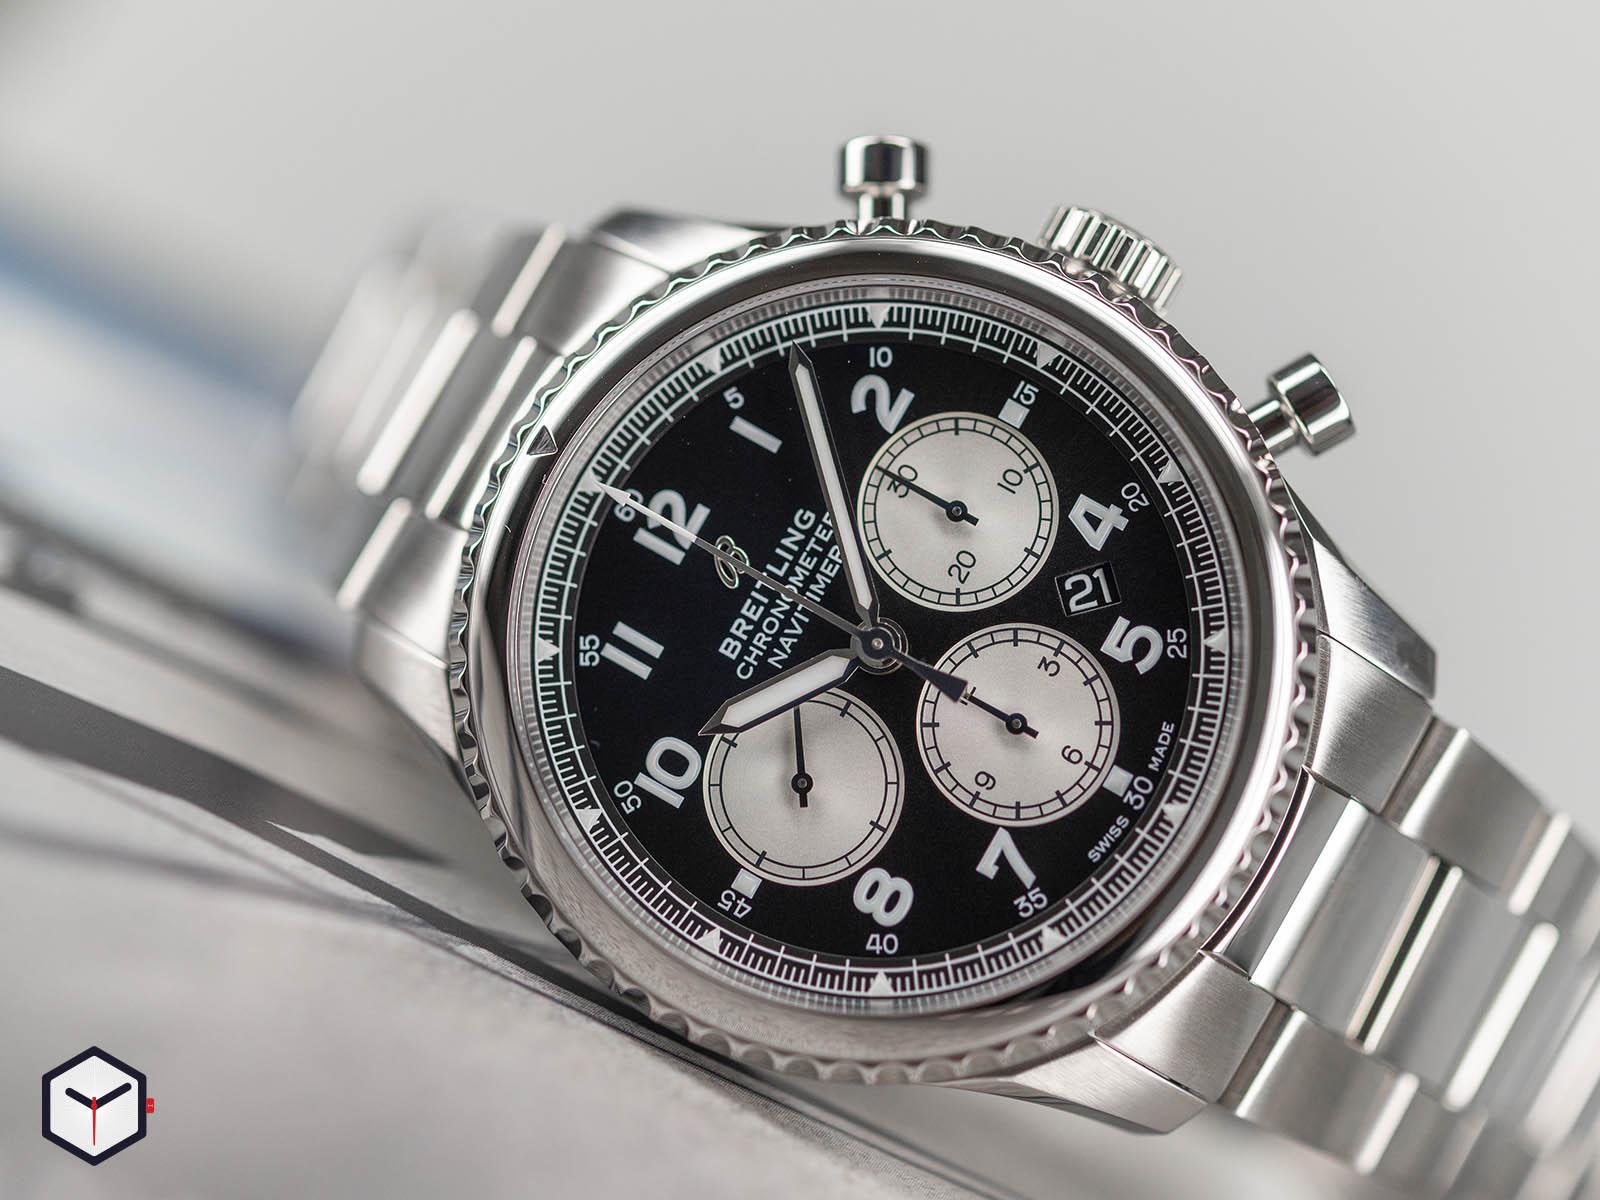 ab0117131b1a1-breitling-navitimer-8-b01-chronograph-1.jpg